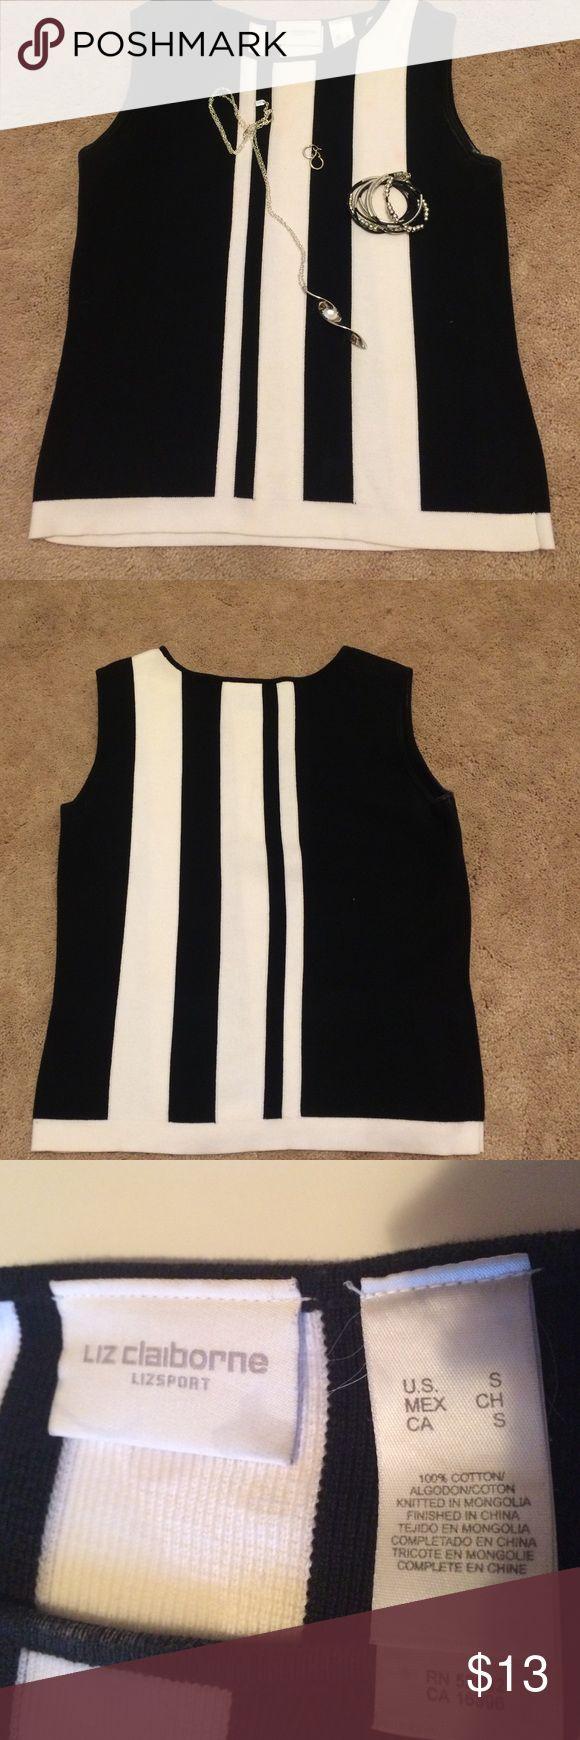 "Sleeveless sweater Liz Claiborne black and white sleeveless sweater. Chest 17"". Length 21"" Liz Claiborne Sweaters"